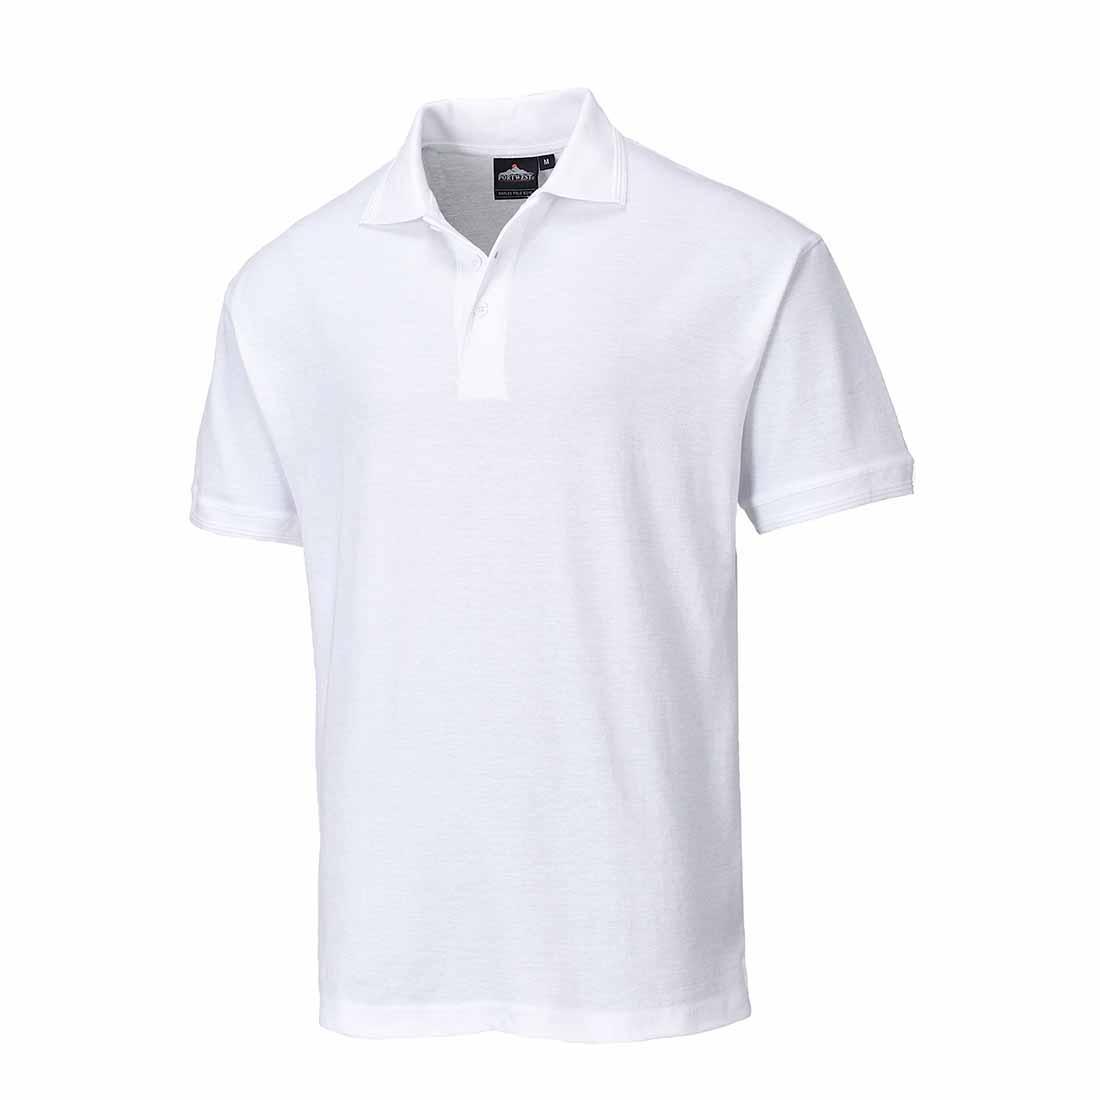 Portwest-Work-Casual-Naples-Mens-Short-Sleeved-Polo-Shirt thumbnail 25